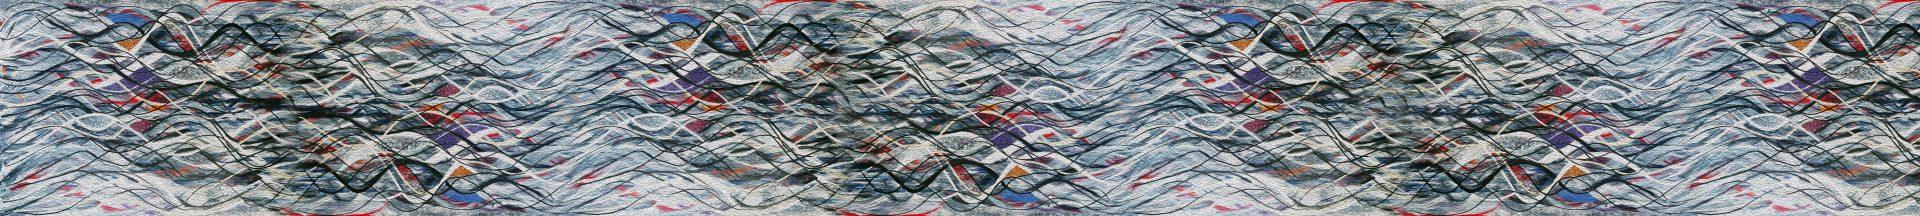 Large Murals - Fémina Virque 3 - Karla Higueros